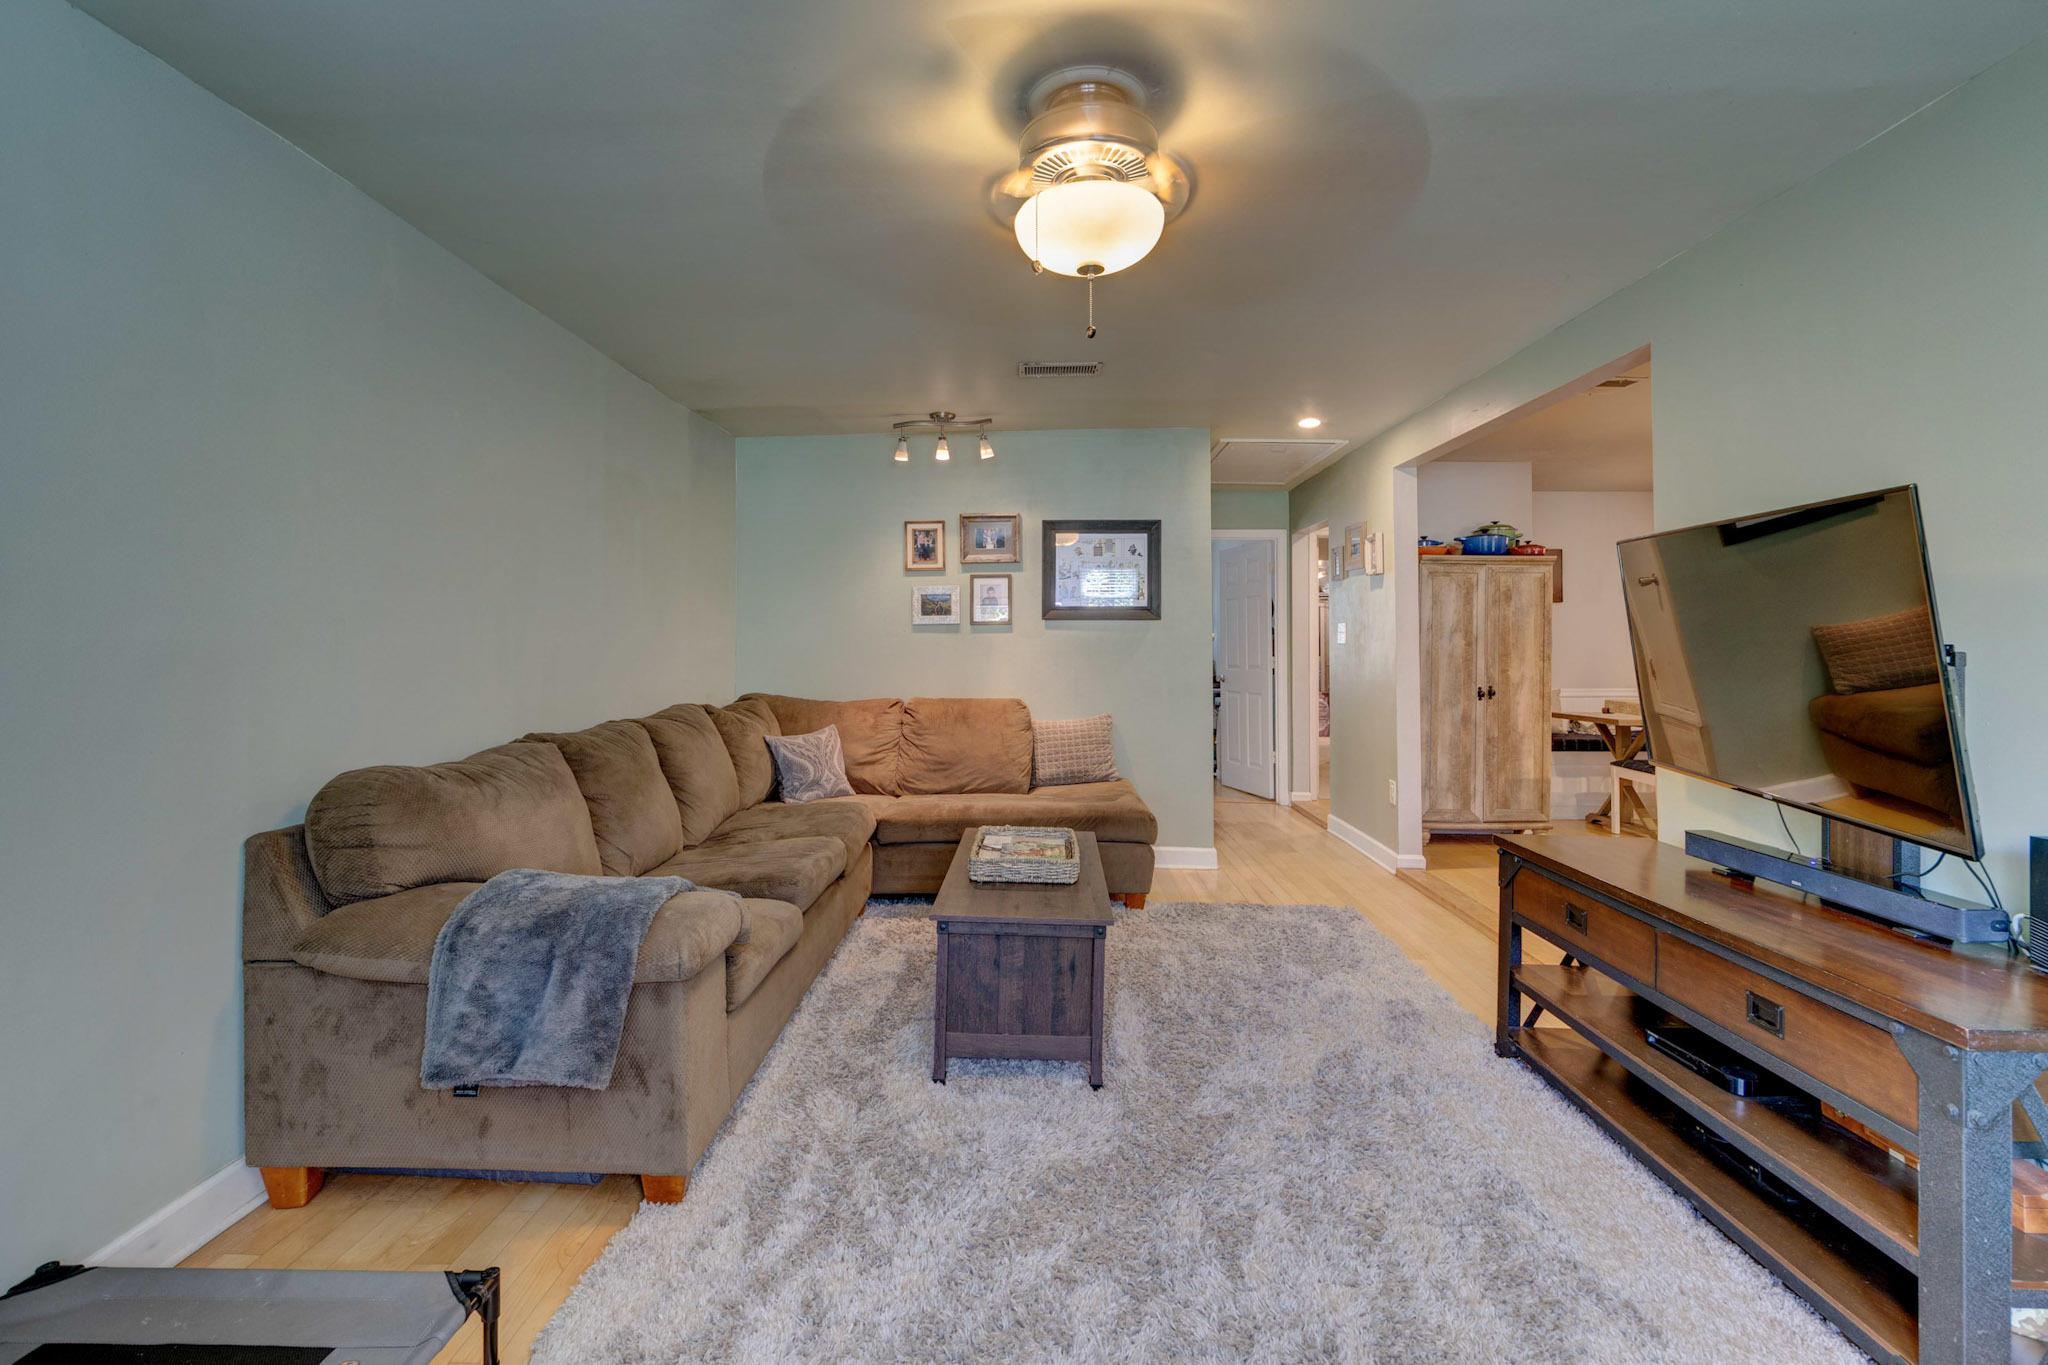 St Andrews Homes For Sale - 1808 2nd, Charleston, SC - 23